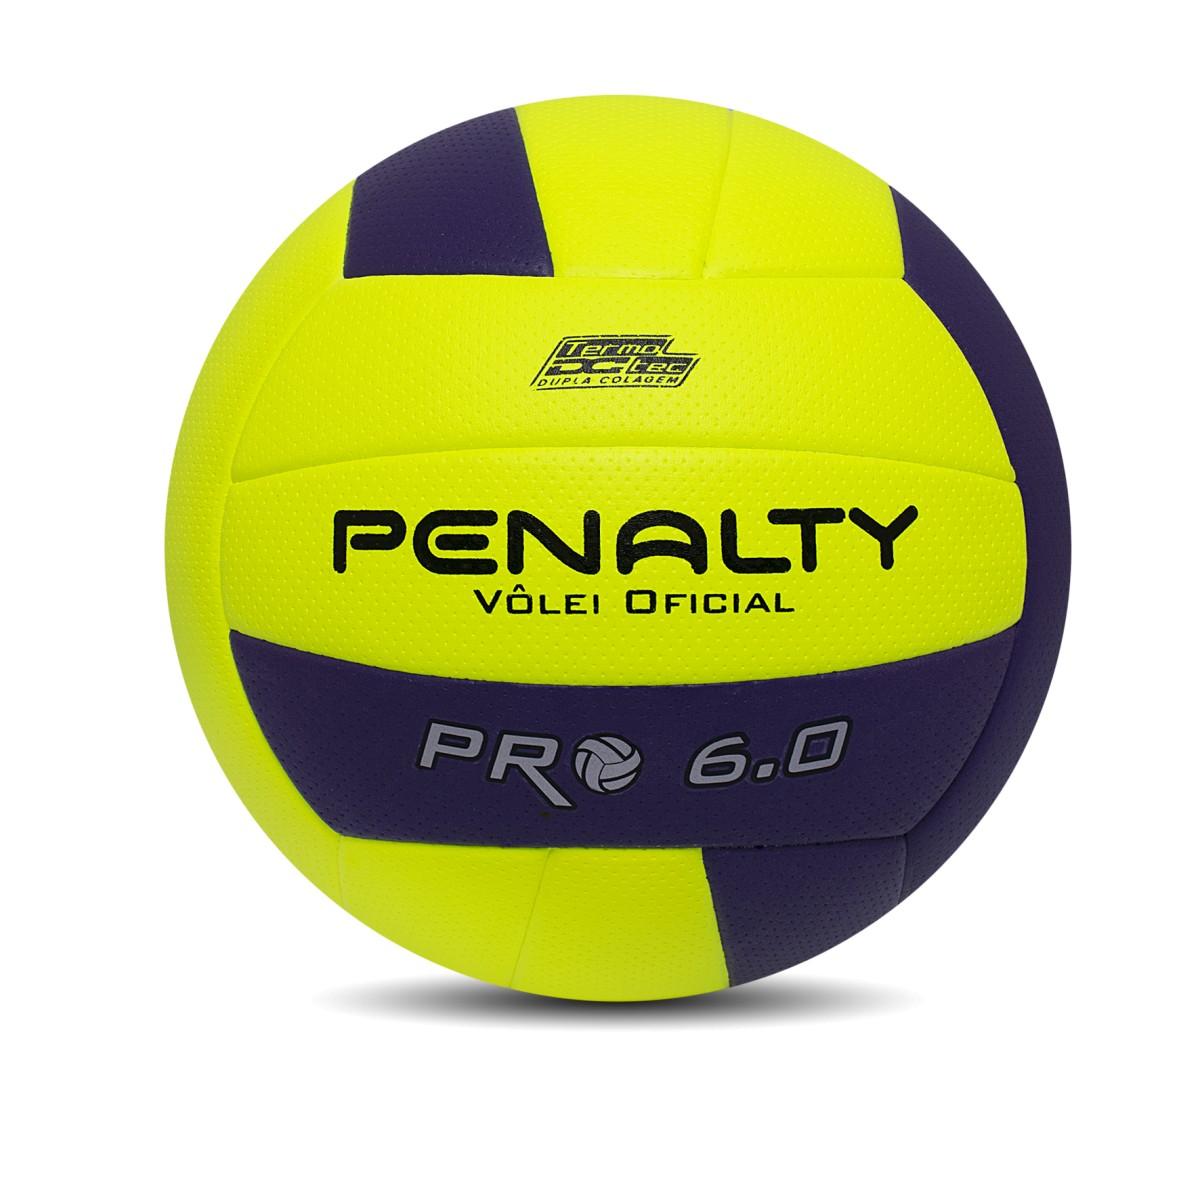 Foto 1 - Bola Penalty Vôlei 6.0 Profissional Amarelo Roxo